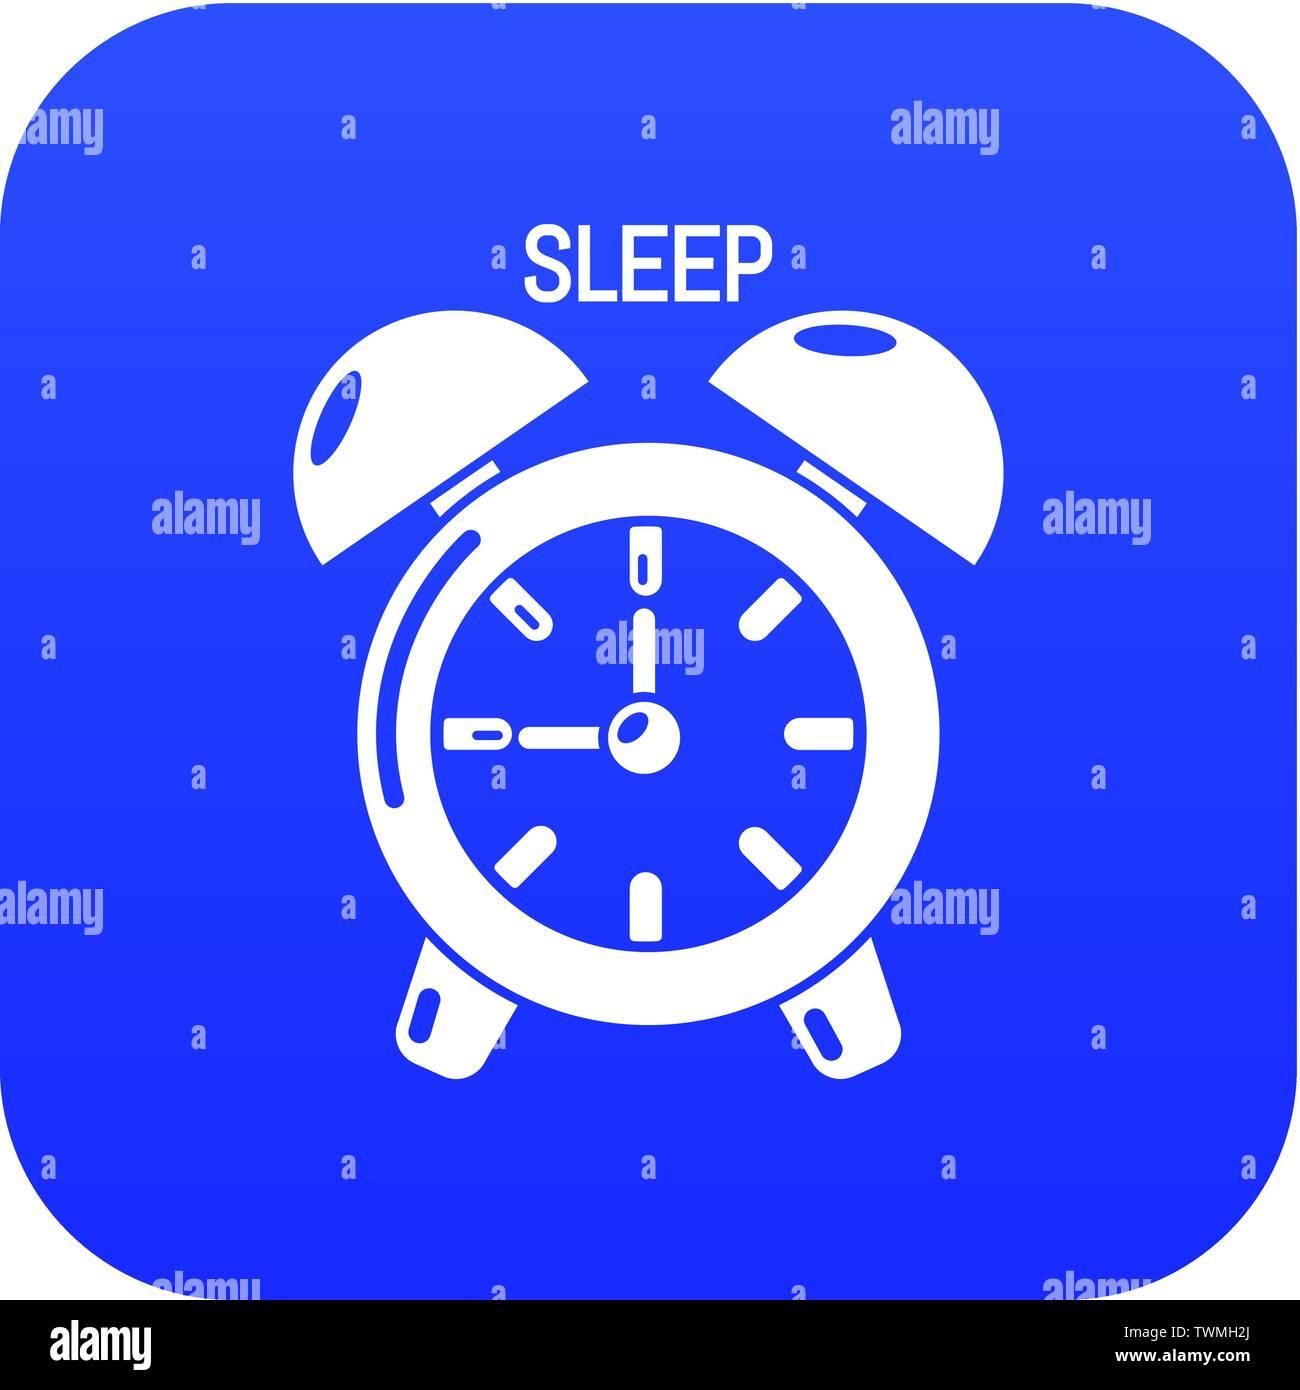 Alarm clock icon blue vector - Stock Image